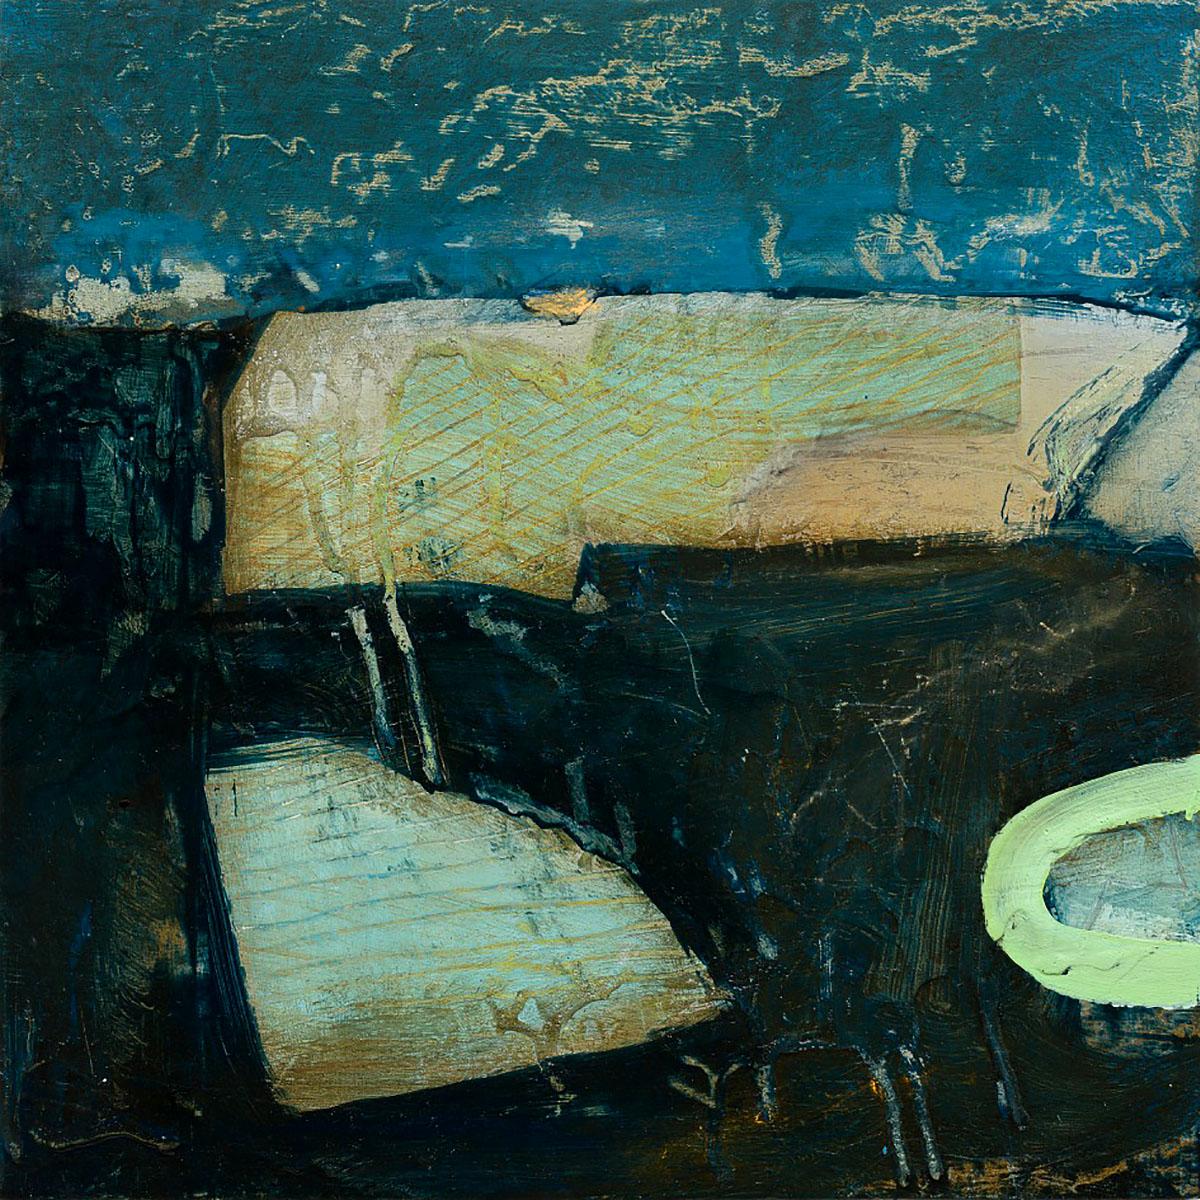 David Mankin, 'Timeless Land', Mixed media on wood panel